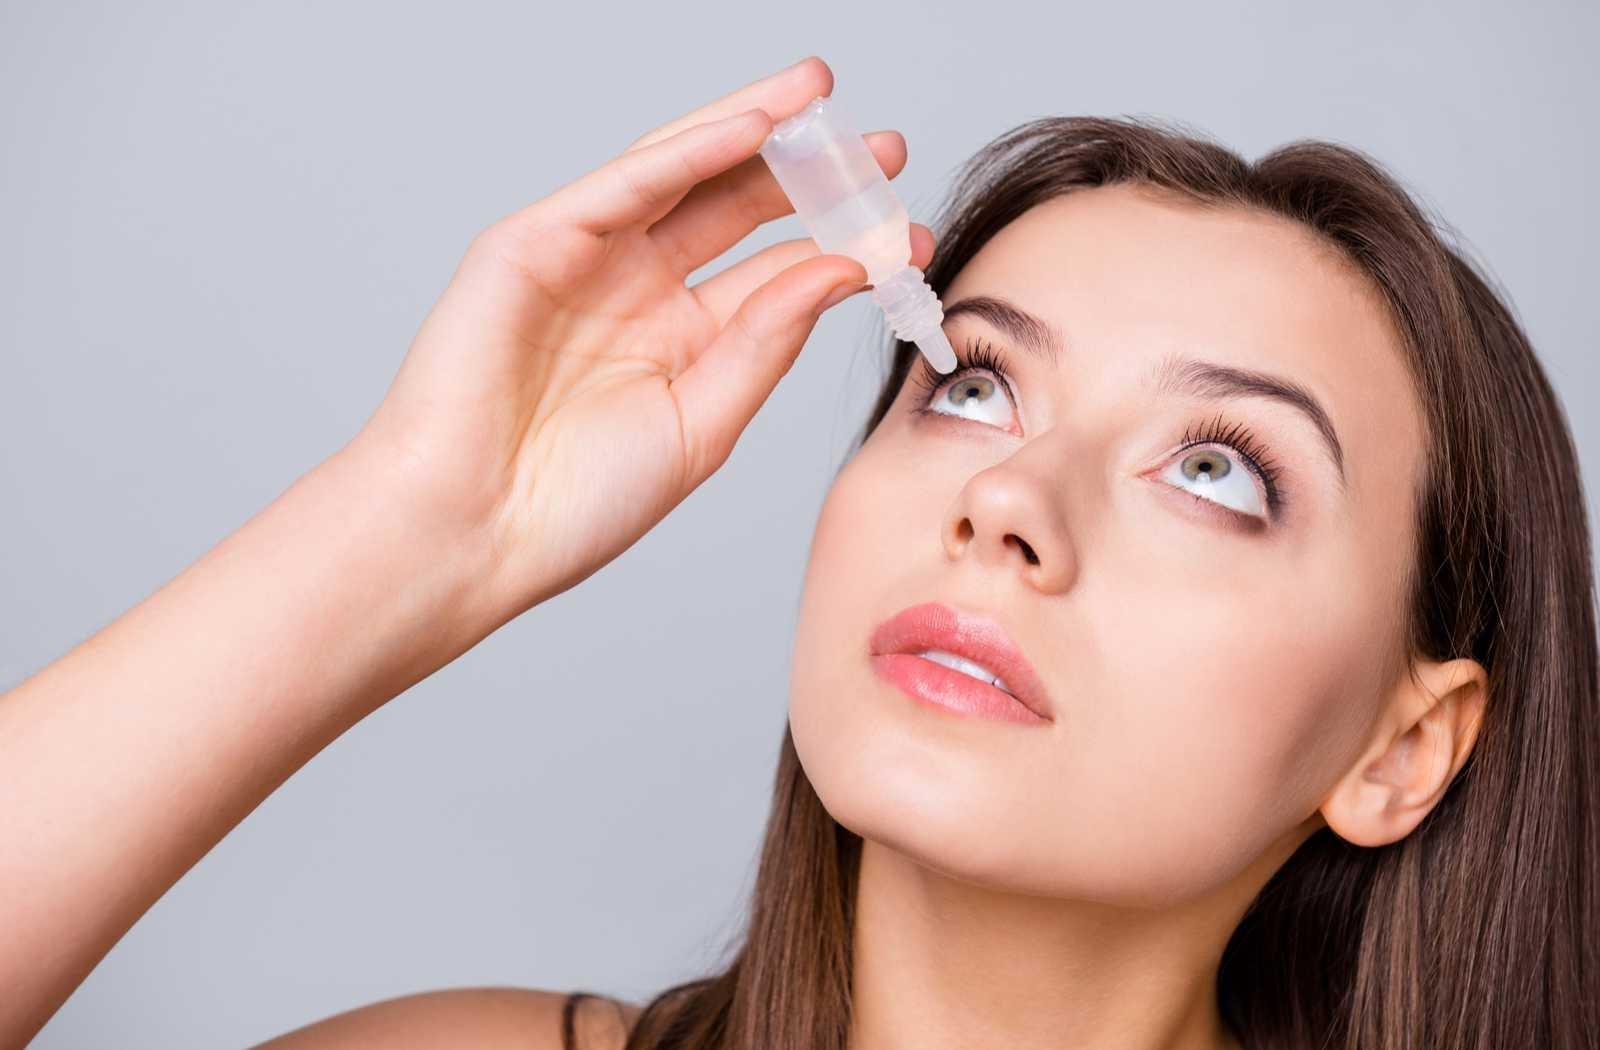 woman applying prescription eye drops